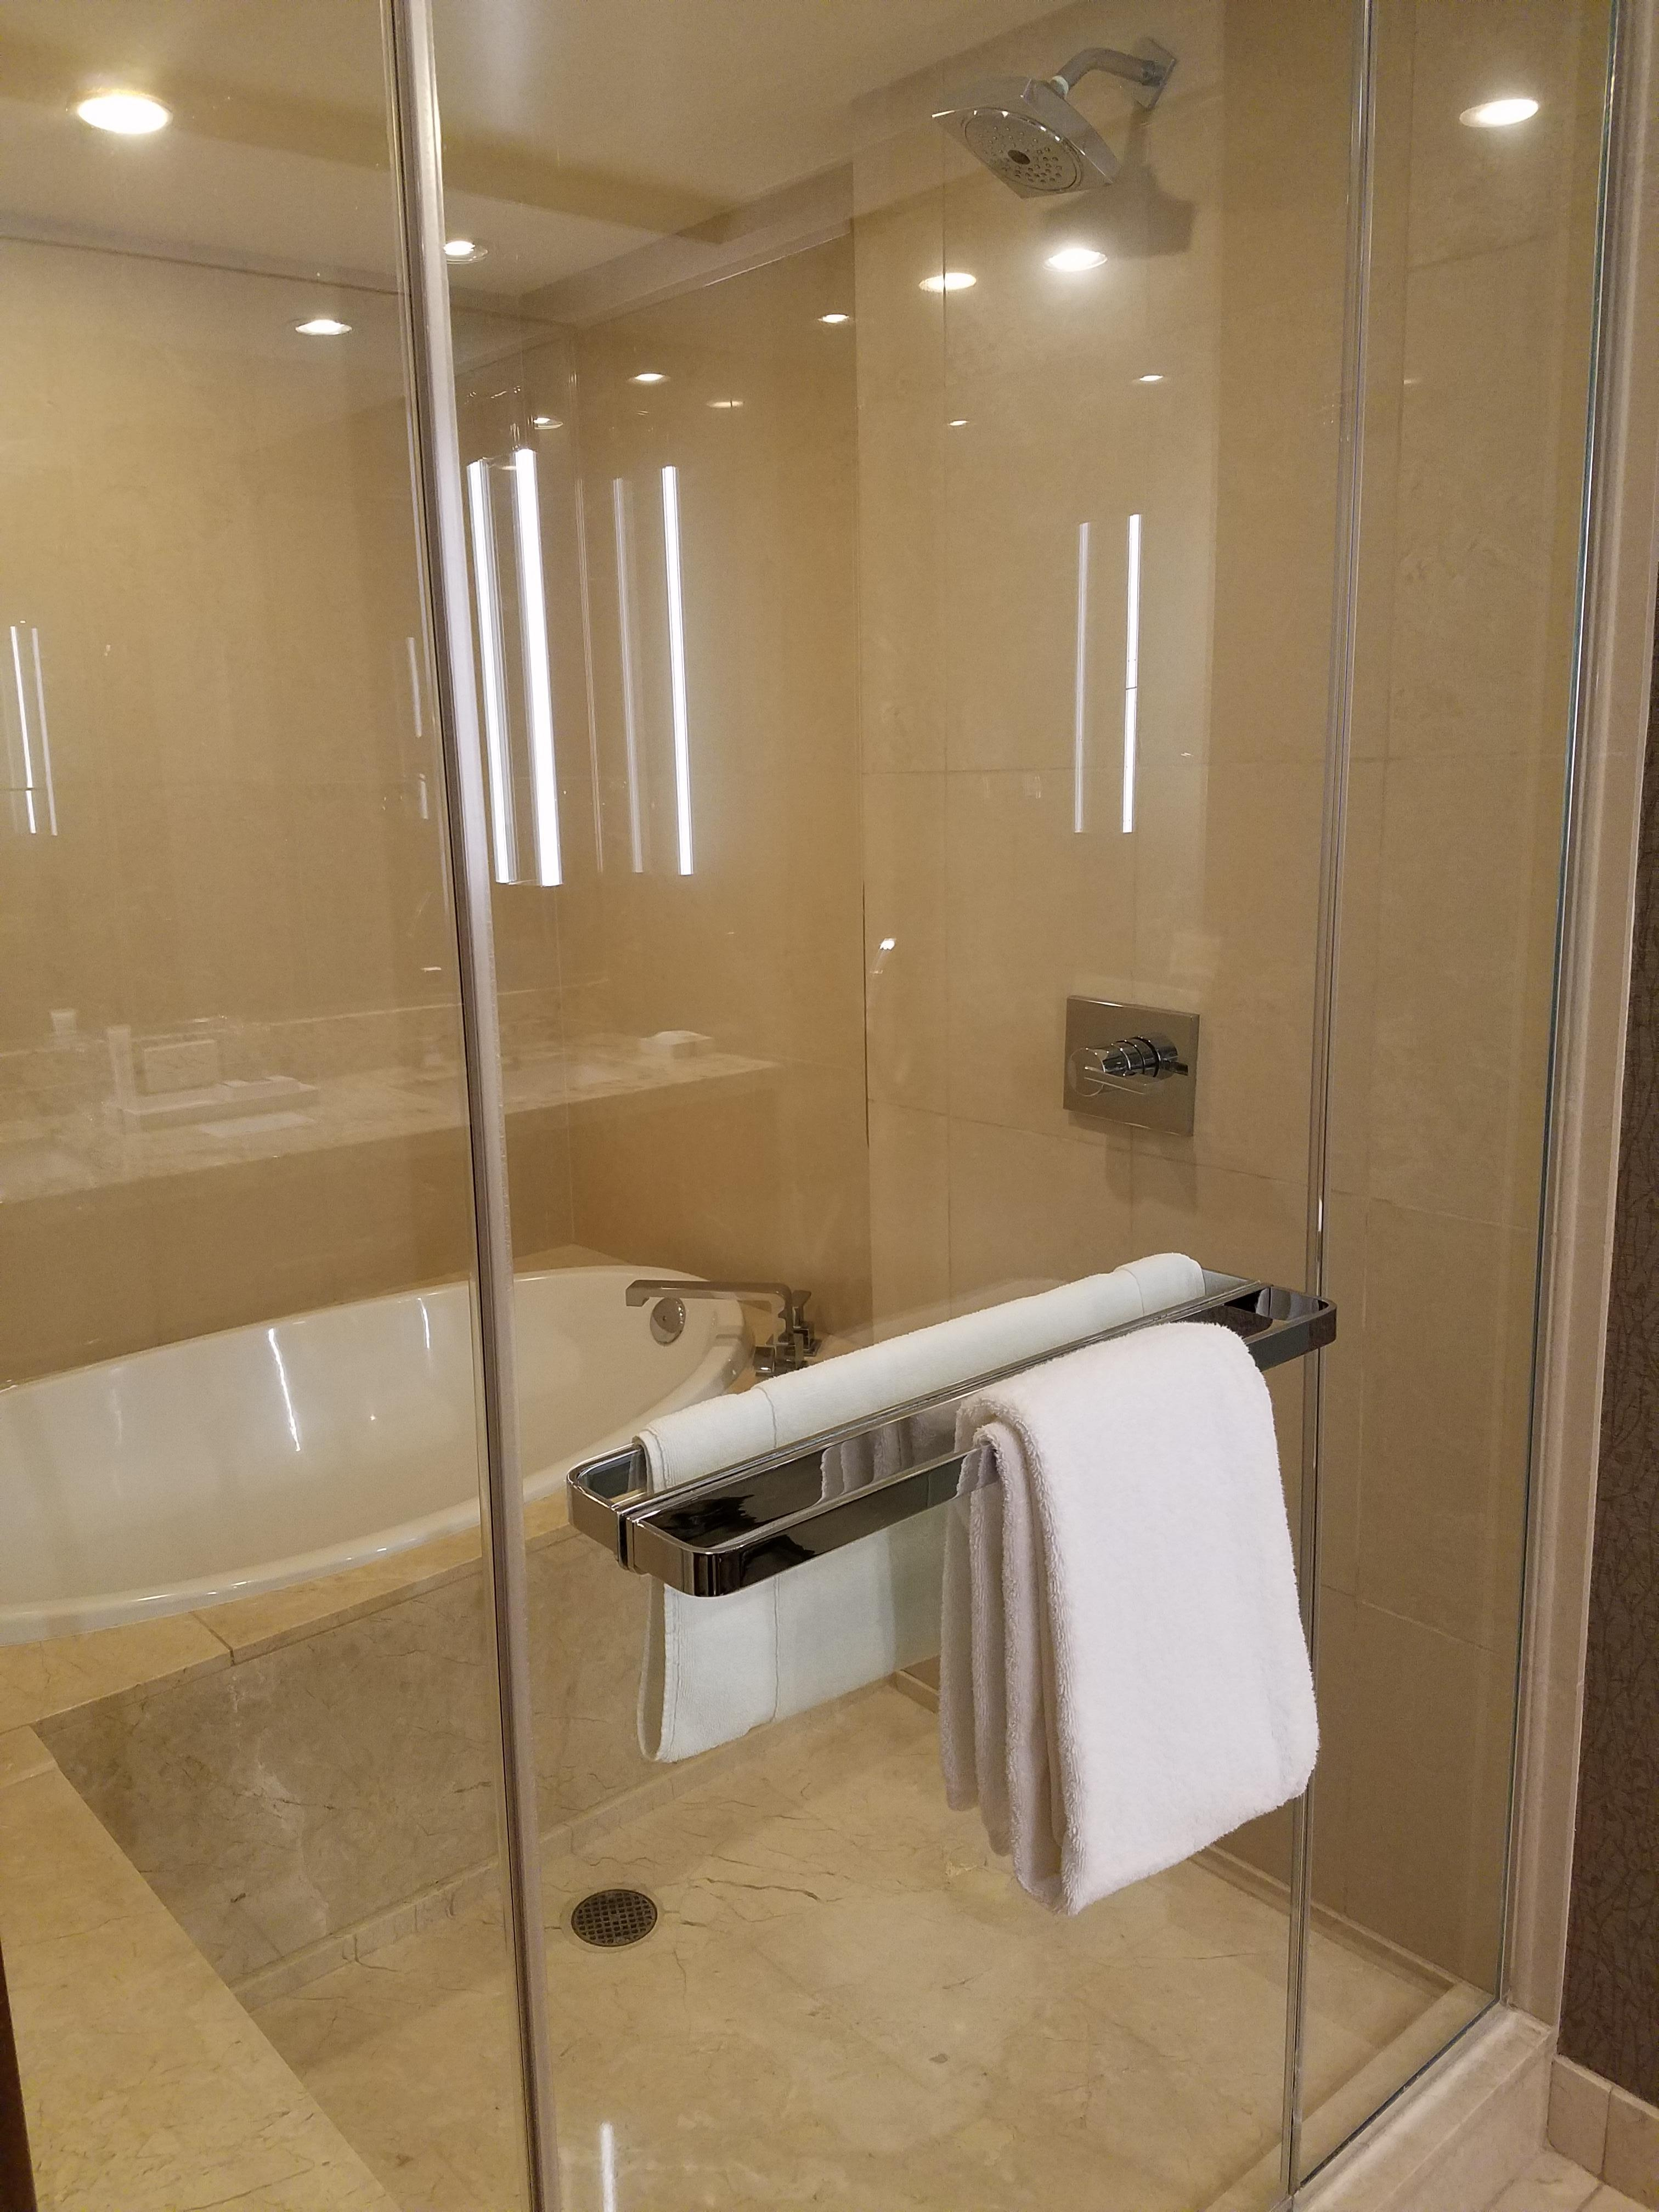 Bathing area in bathroom